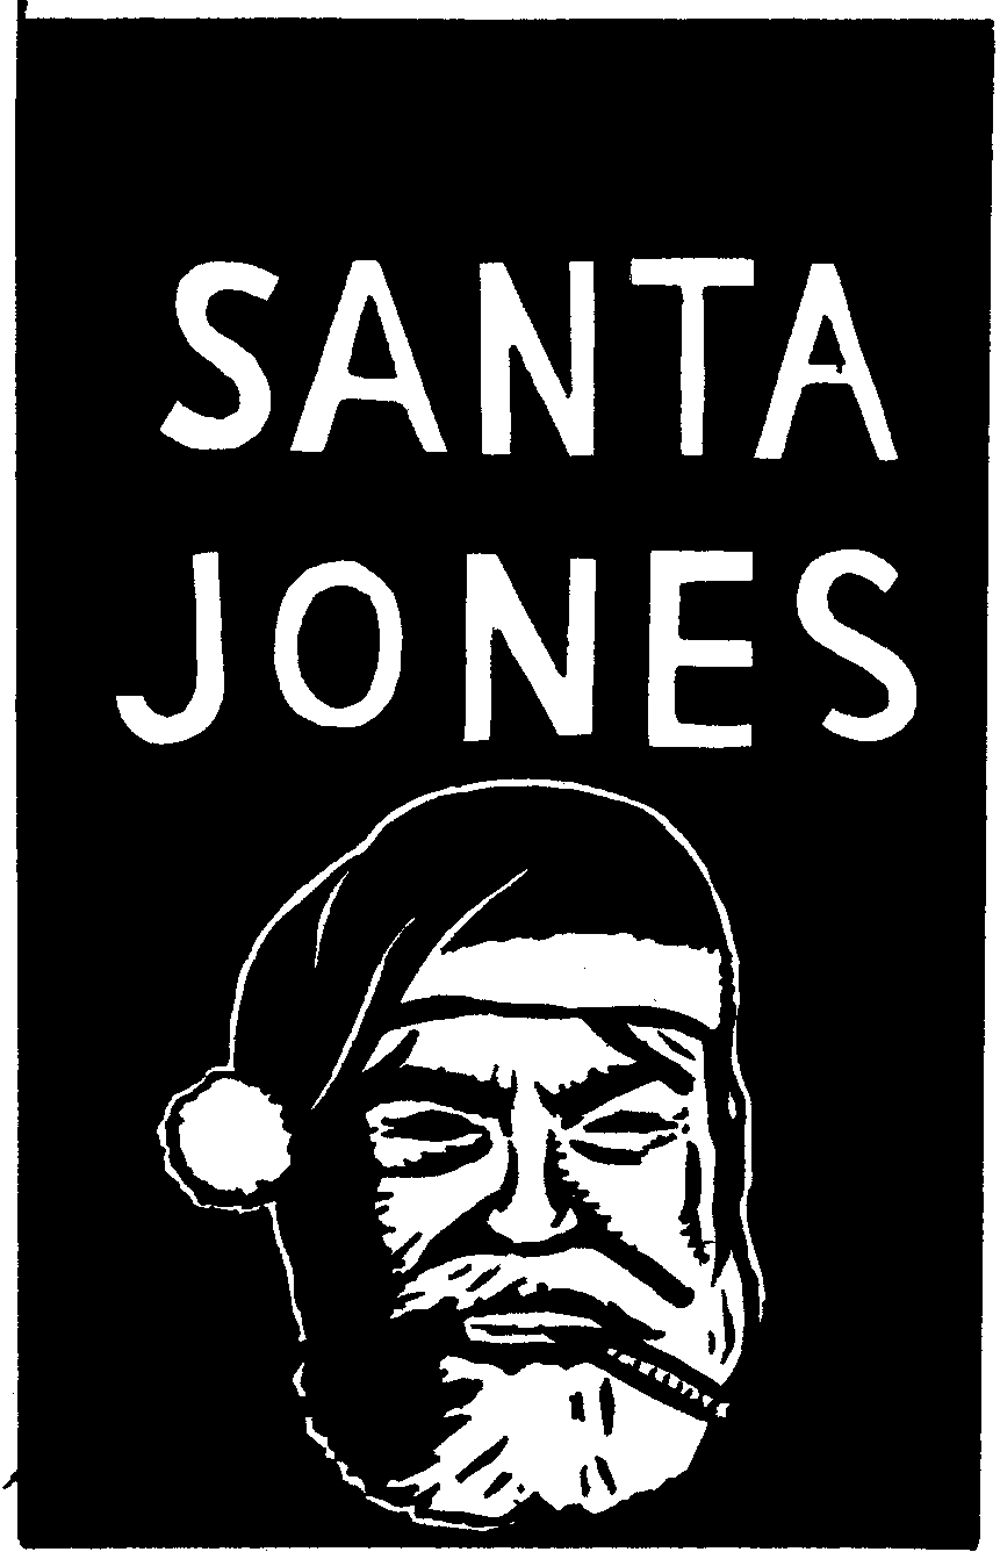 SantaJones1.png